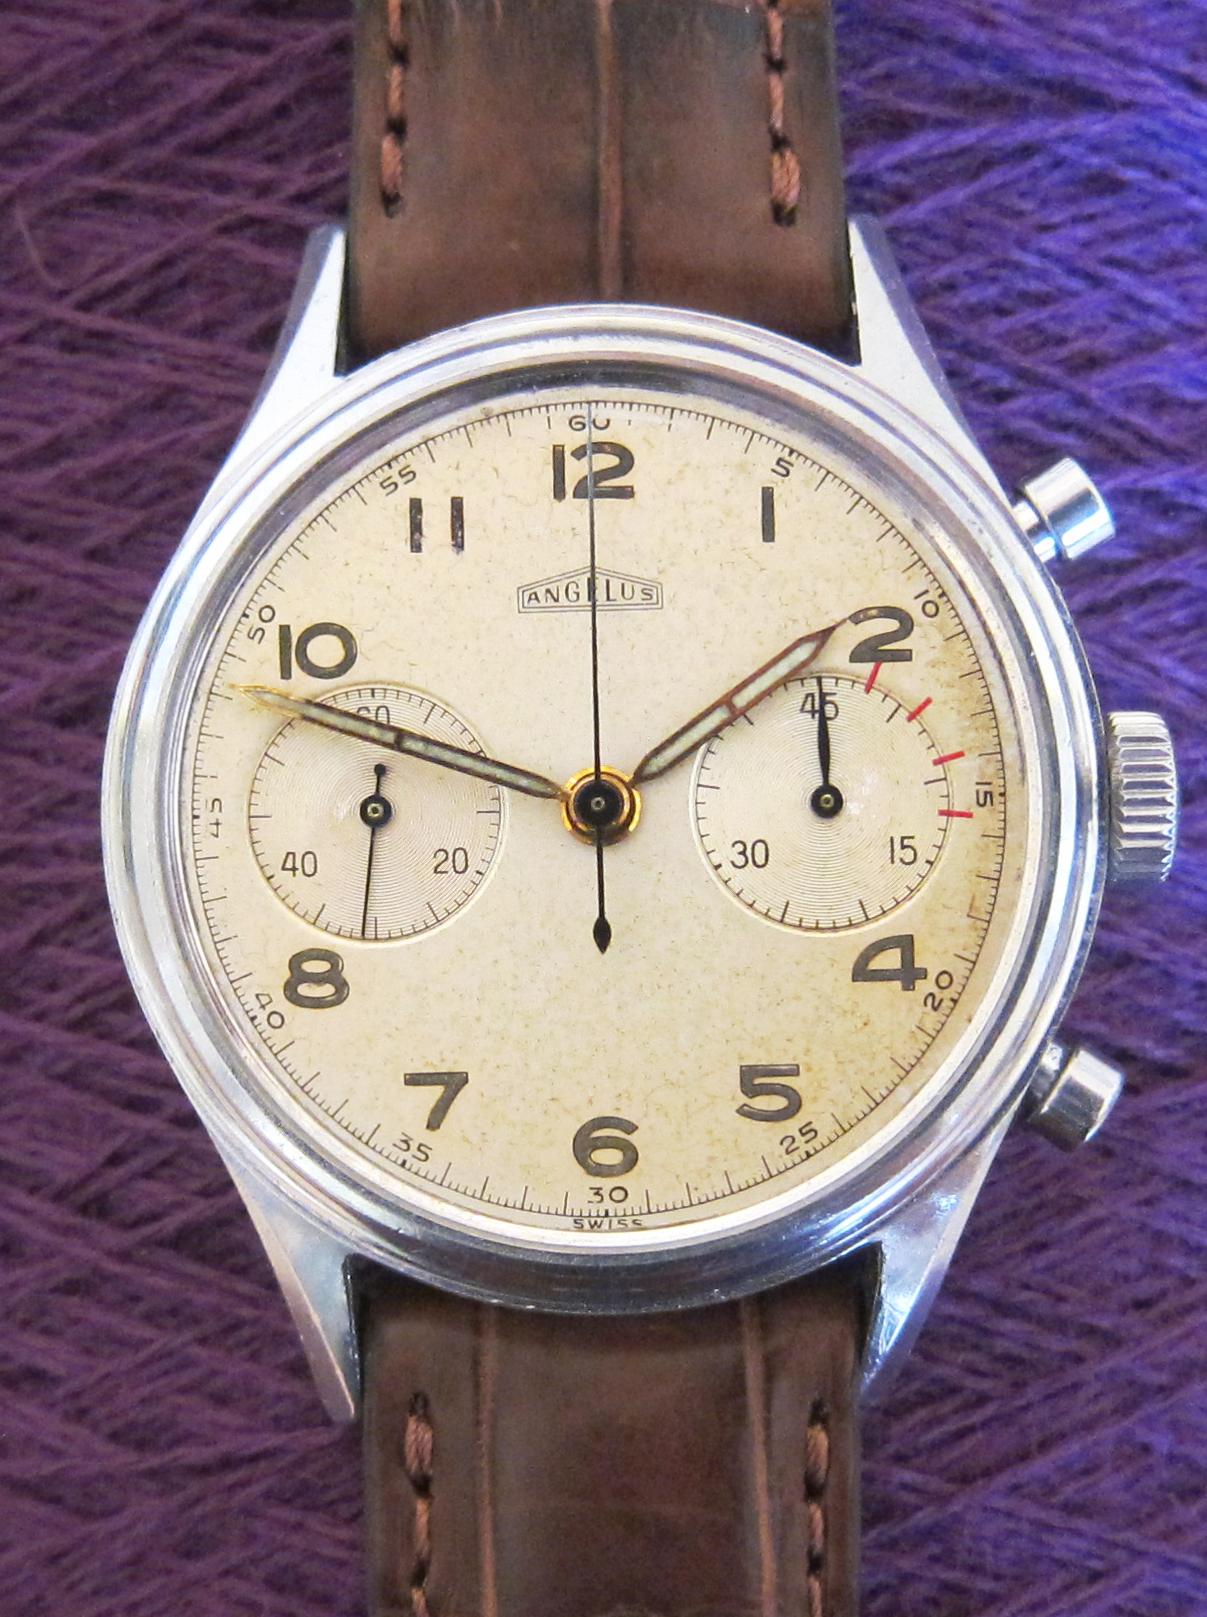 Big ANGELUS chronograph